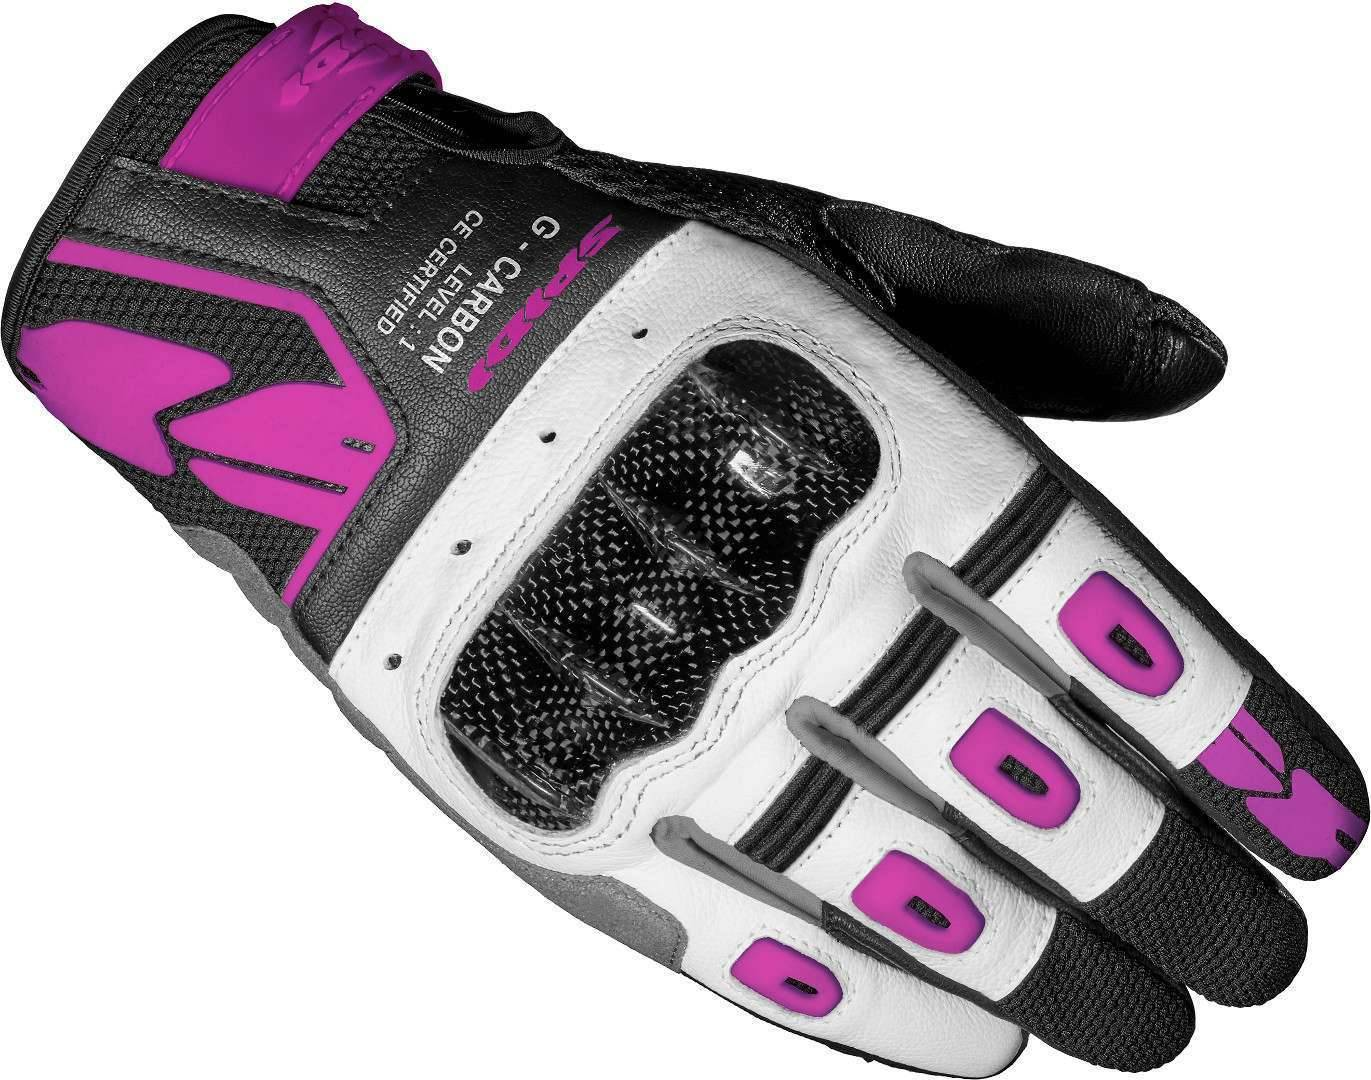 Spidi G-Carbon Botas de moto para mujer Negro Blanco Rosa L